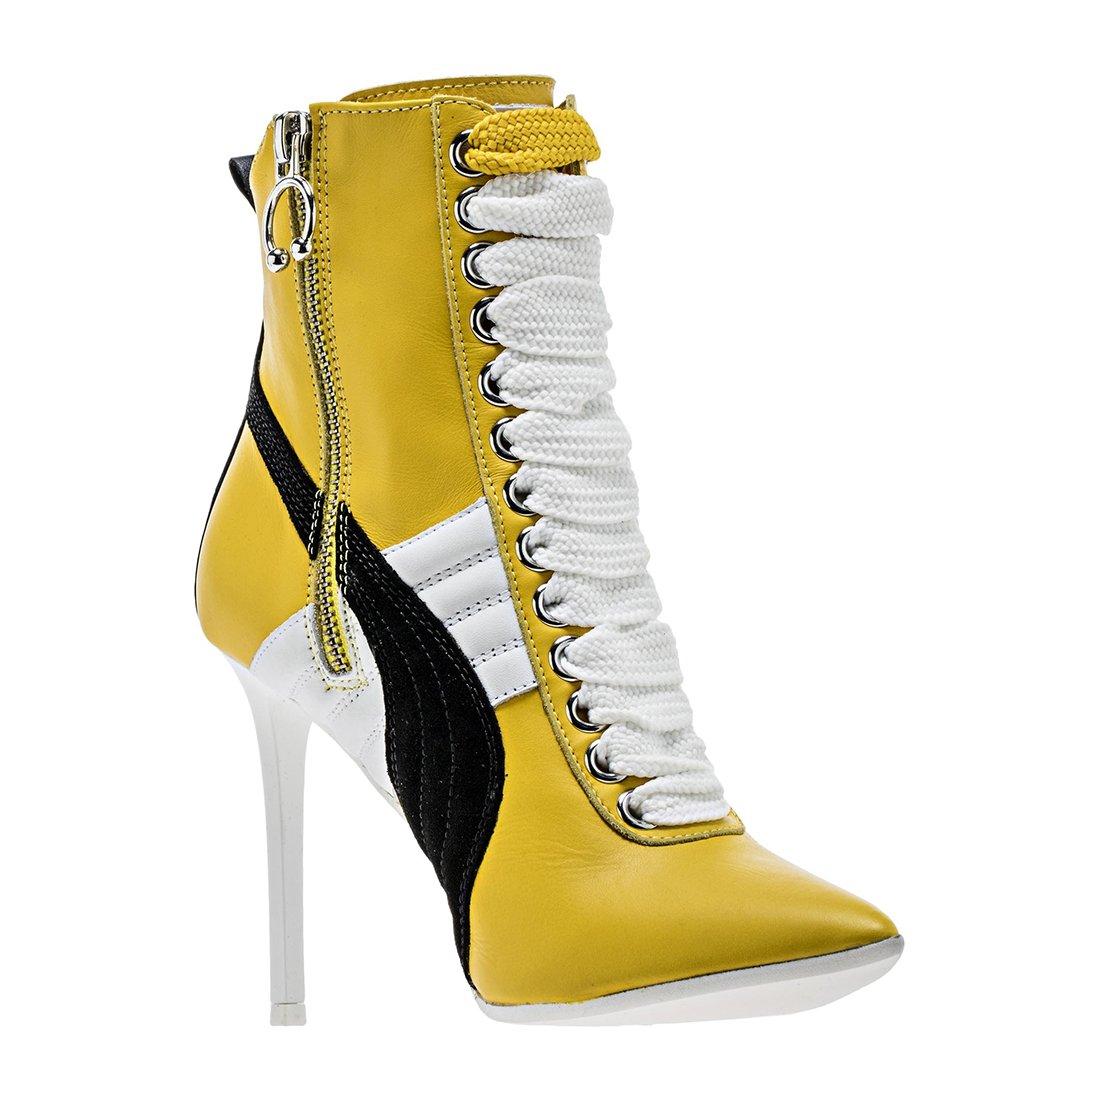 PUMA Women's x Rihanna Sneaker Booties B06VWQWC1V 6 B(M) US|Dandelion / White-puma White